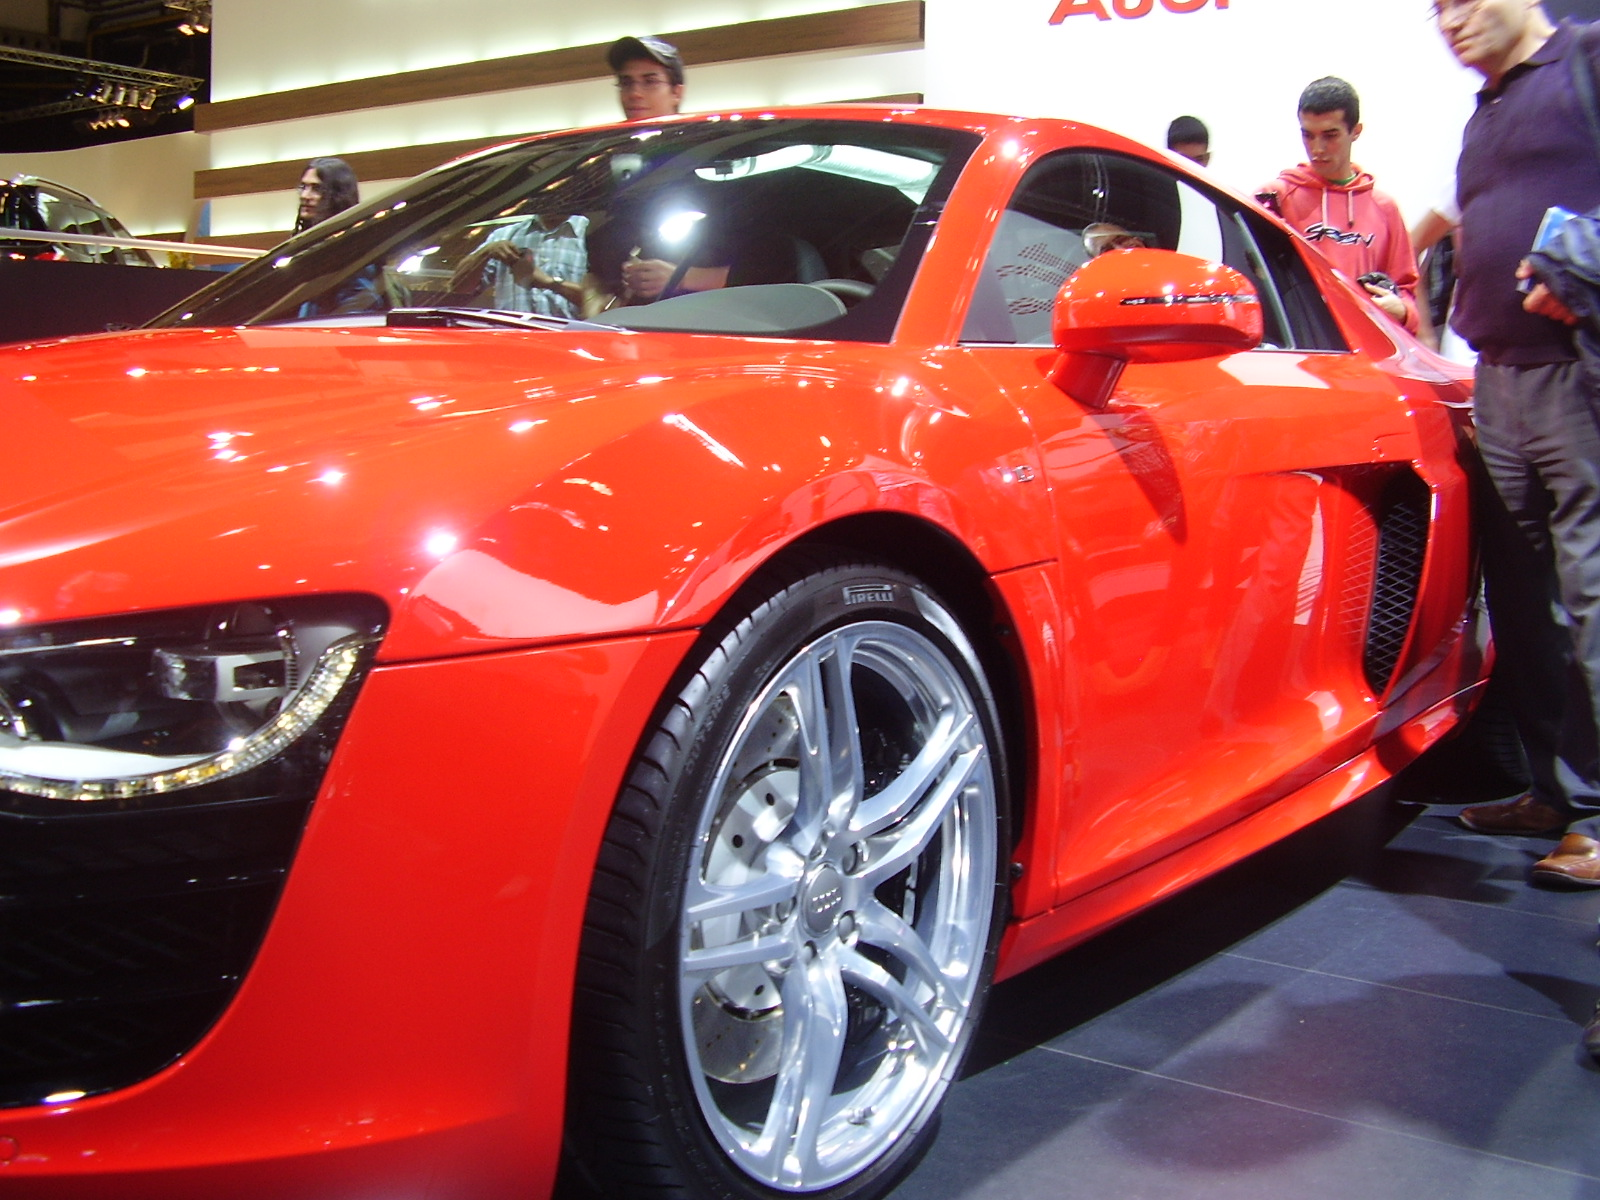 Visita Salon Automovil 09 BCN / Visit to Car Exhibition 09 Barcelona-P5140741.JPG